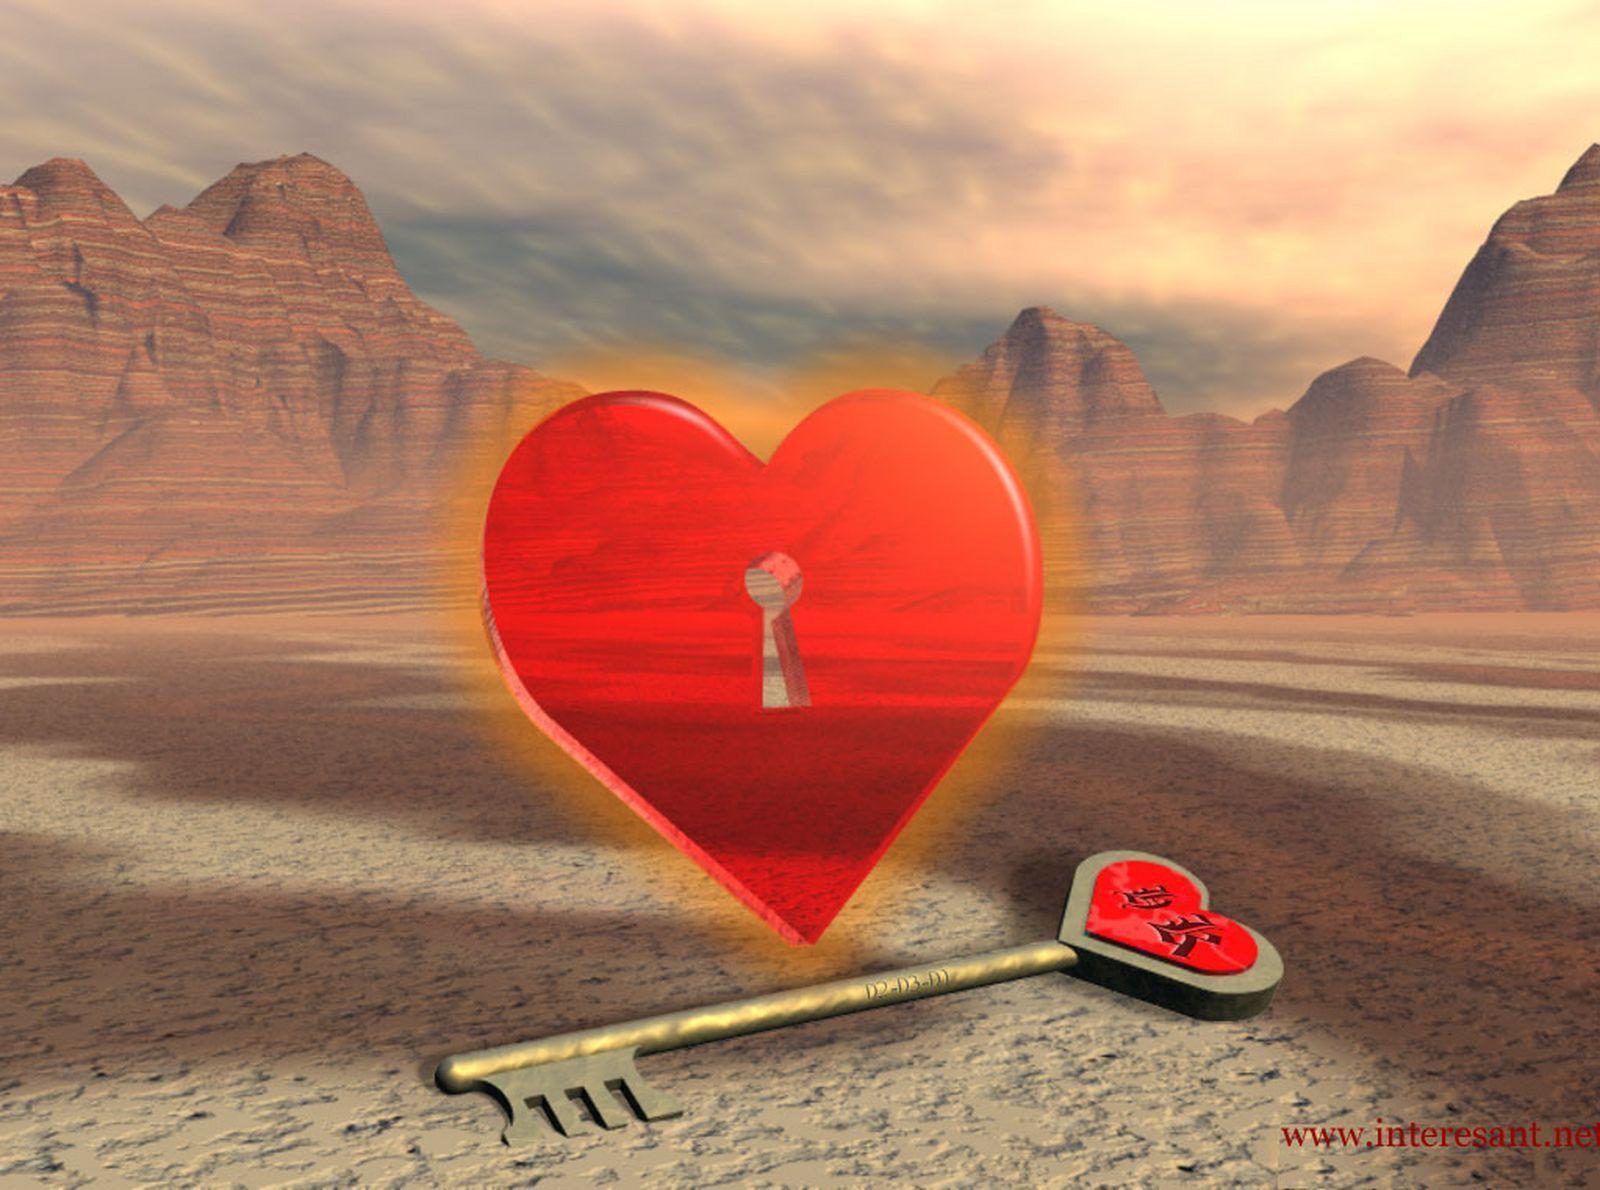 http://3.bp.blogspot.com/-sUKRTIhC9k8/UImCanI8Y8I/AAAAAAAAASA/PFI4hdzQt3U/s1600/Love-Wallpaper-love-2939258-1600-1190.jpg